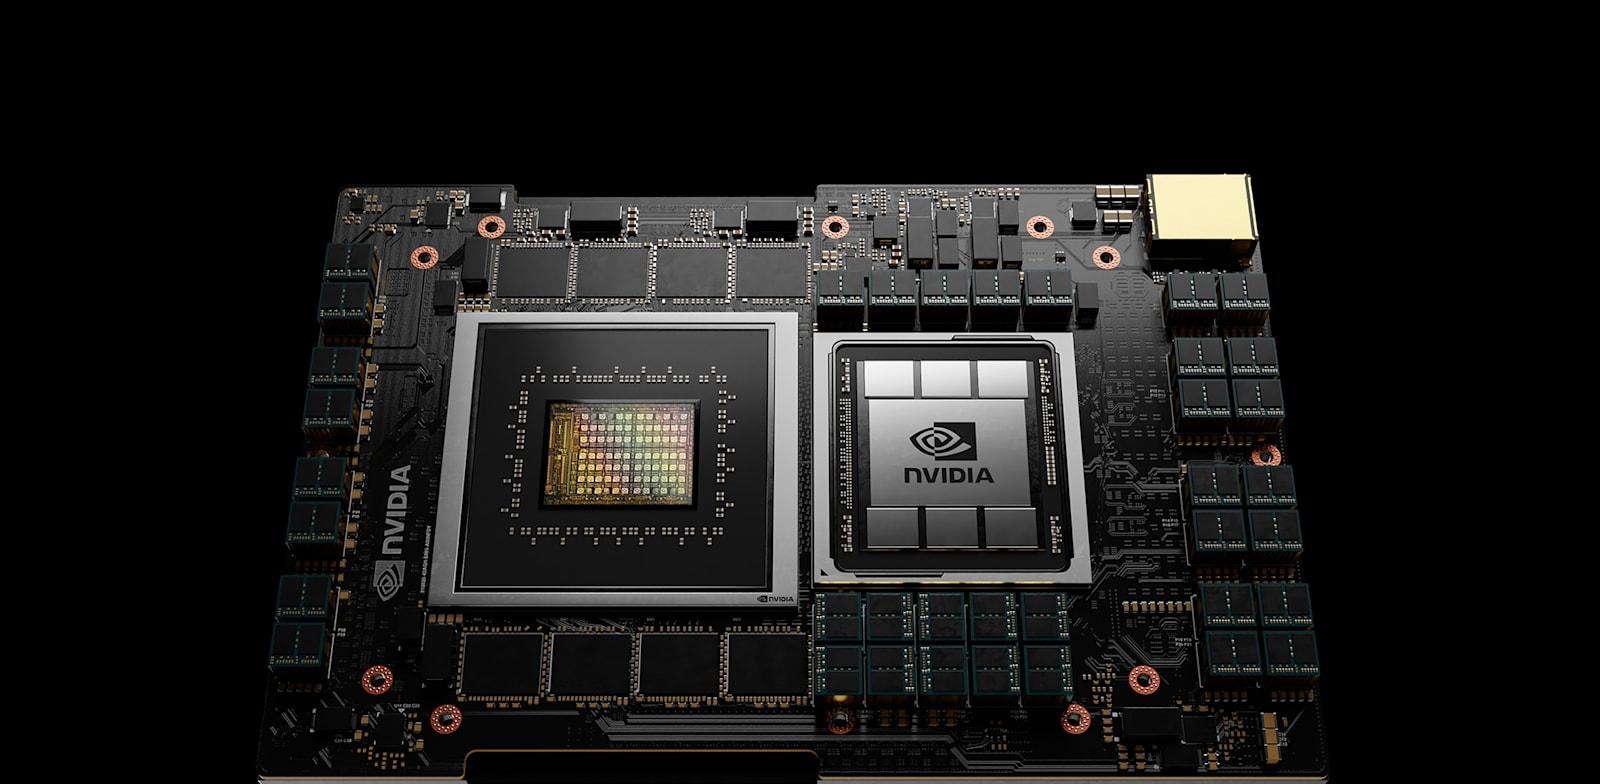 NVIDIA Grace – מעבד (CPU) המיועד למרכזי נתונים ומבוסס על ליבות ARM / צילום: באדיבות NVIDIA